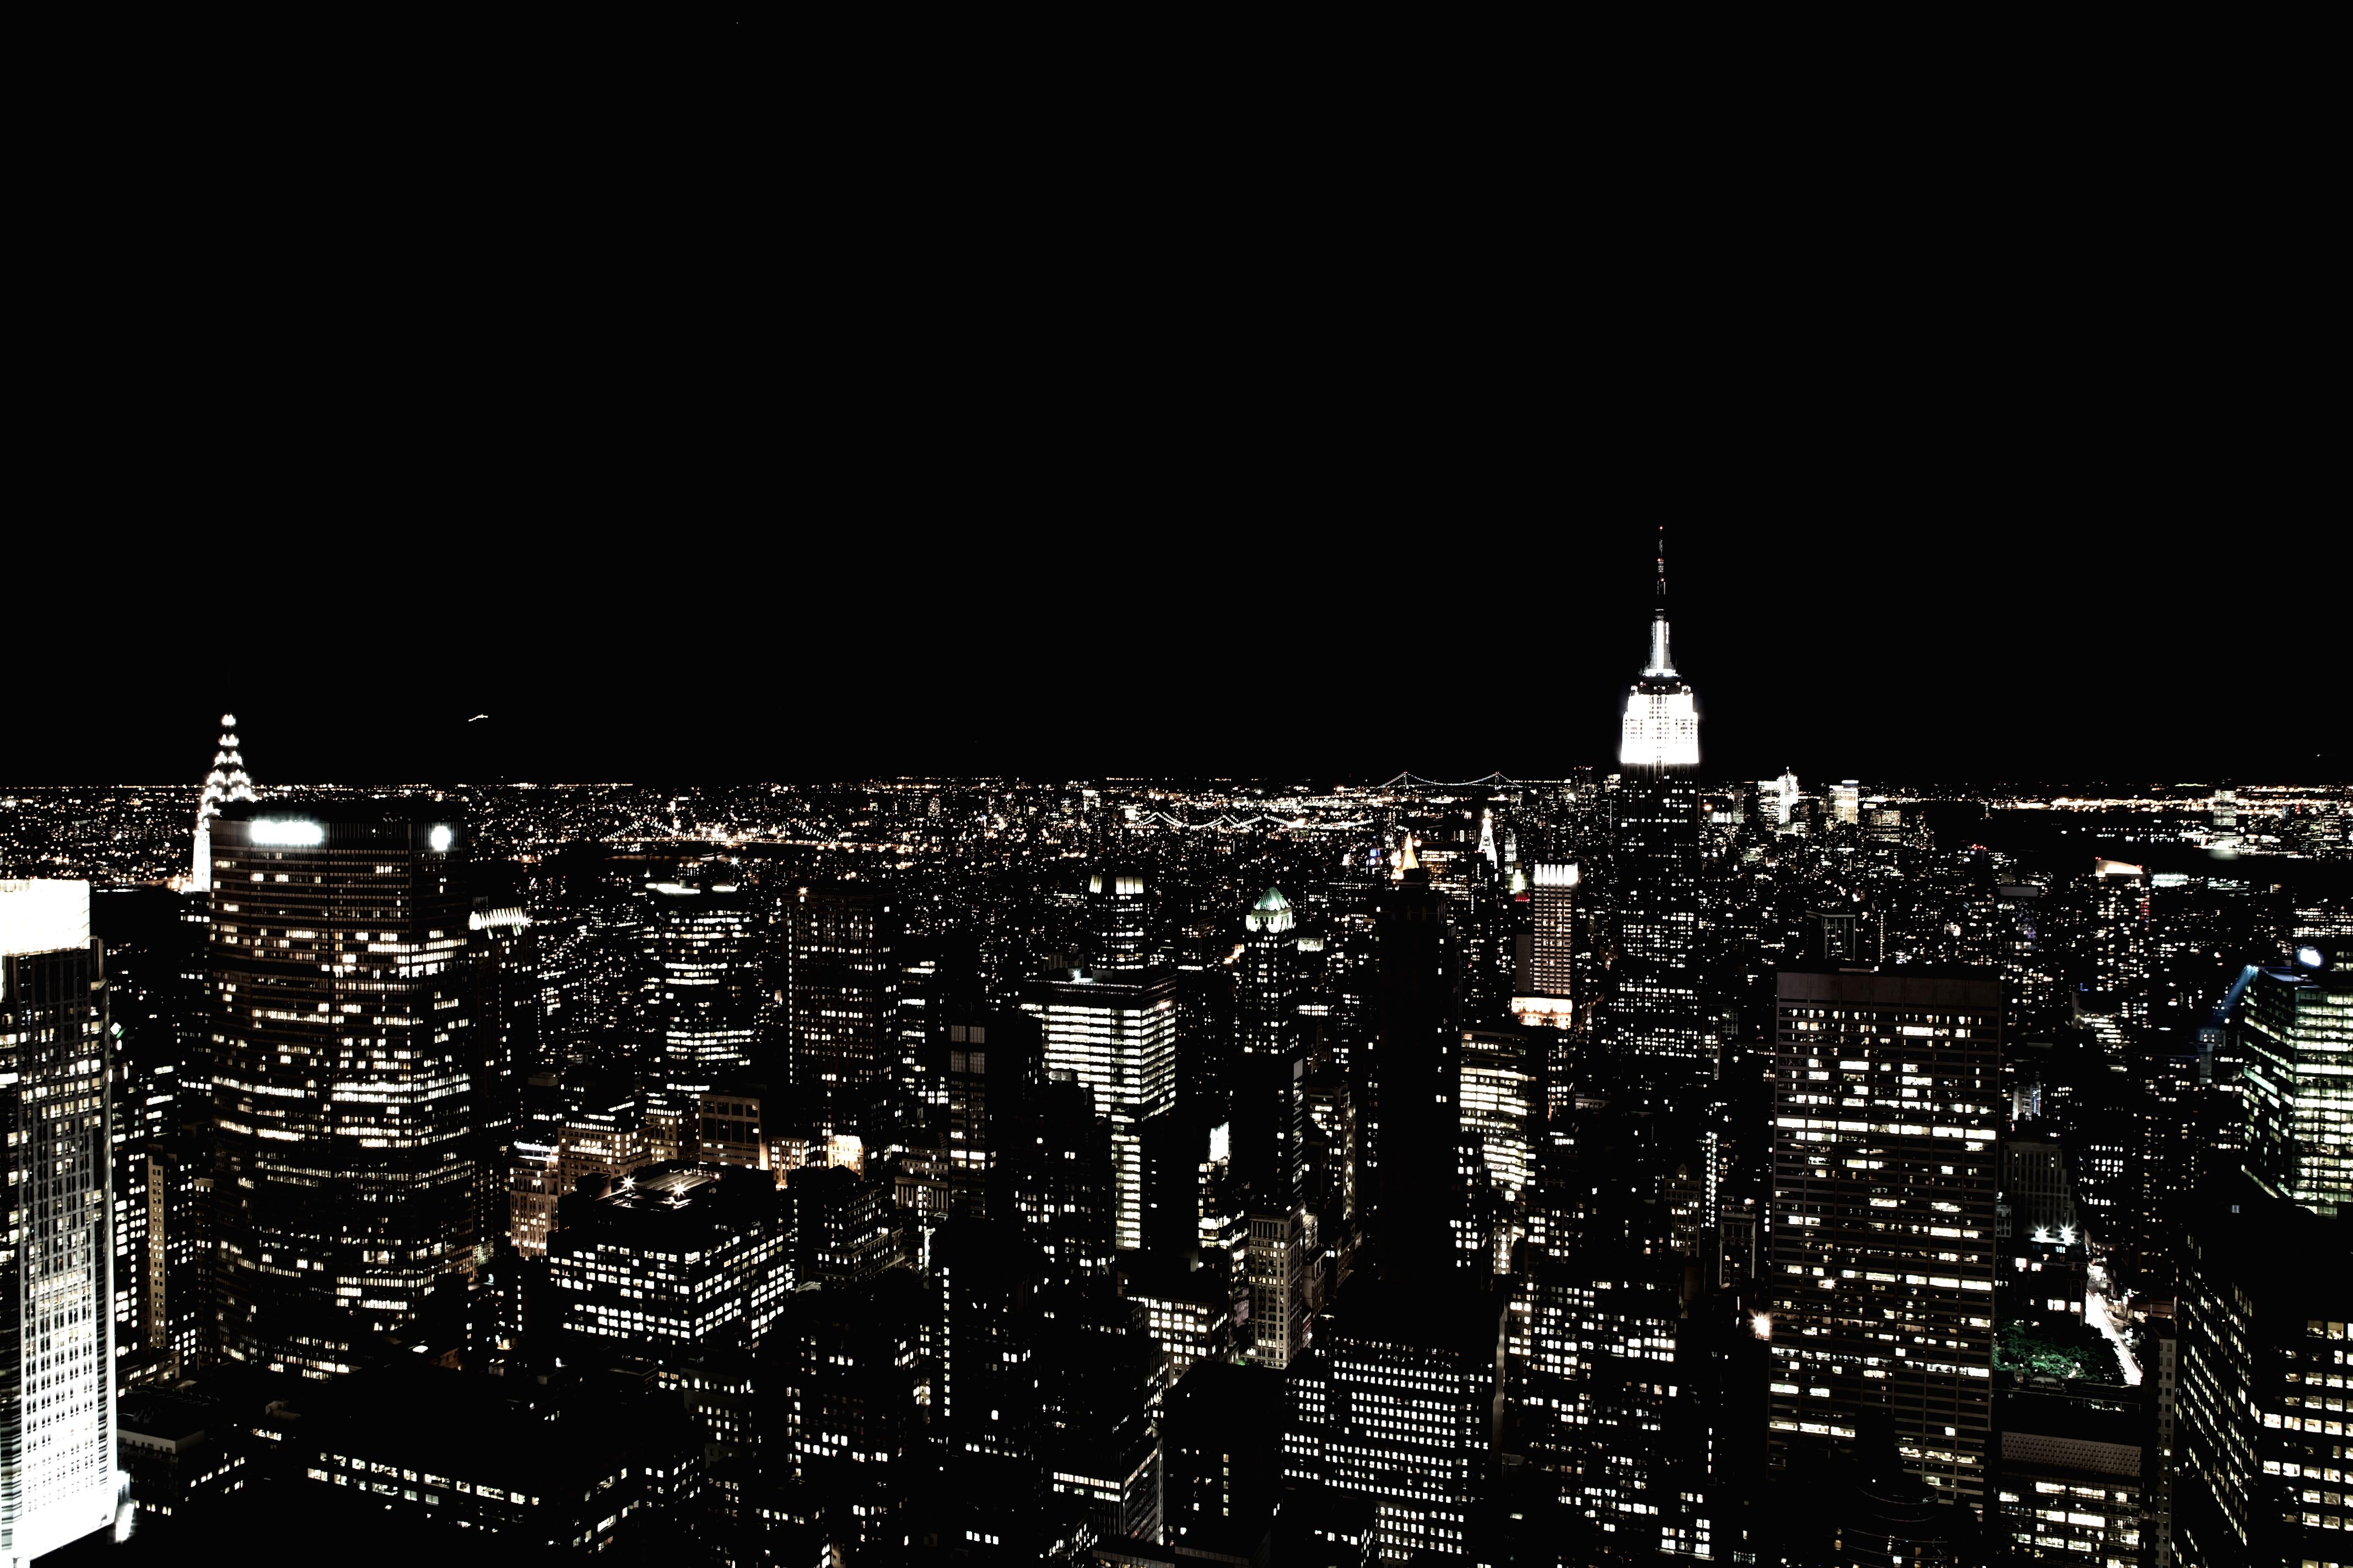 New York 4k Ultra Hd Wallpaper Background Image 4270x2846 Id 965738 Wallpaper Abyss